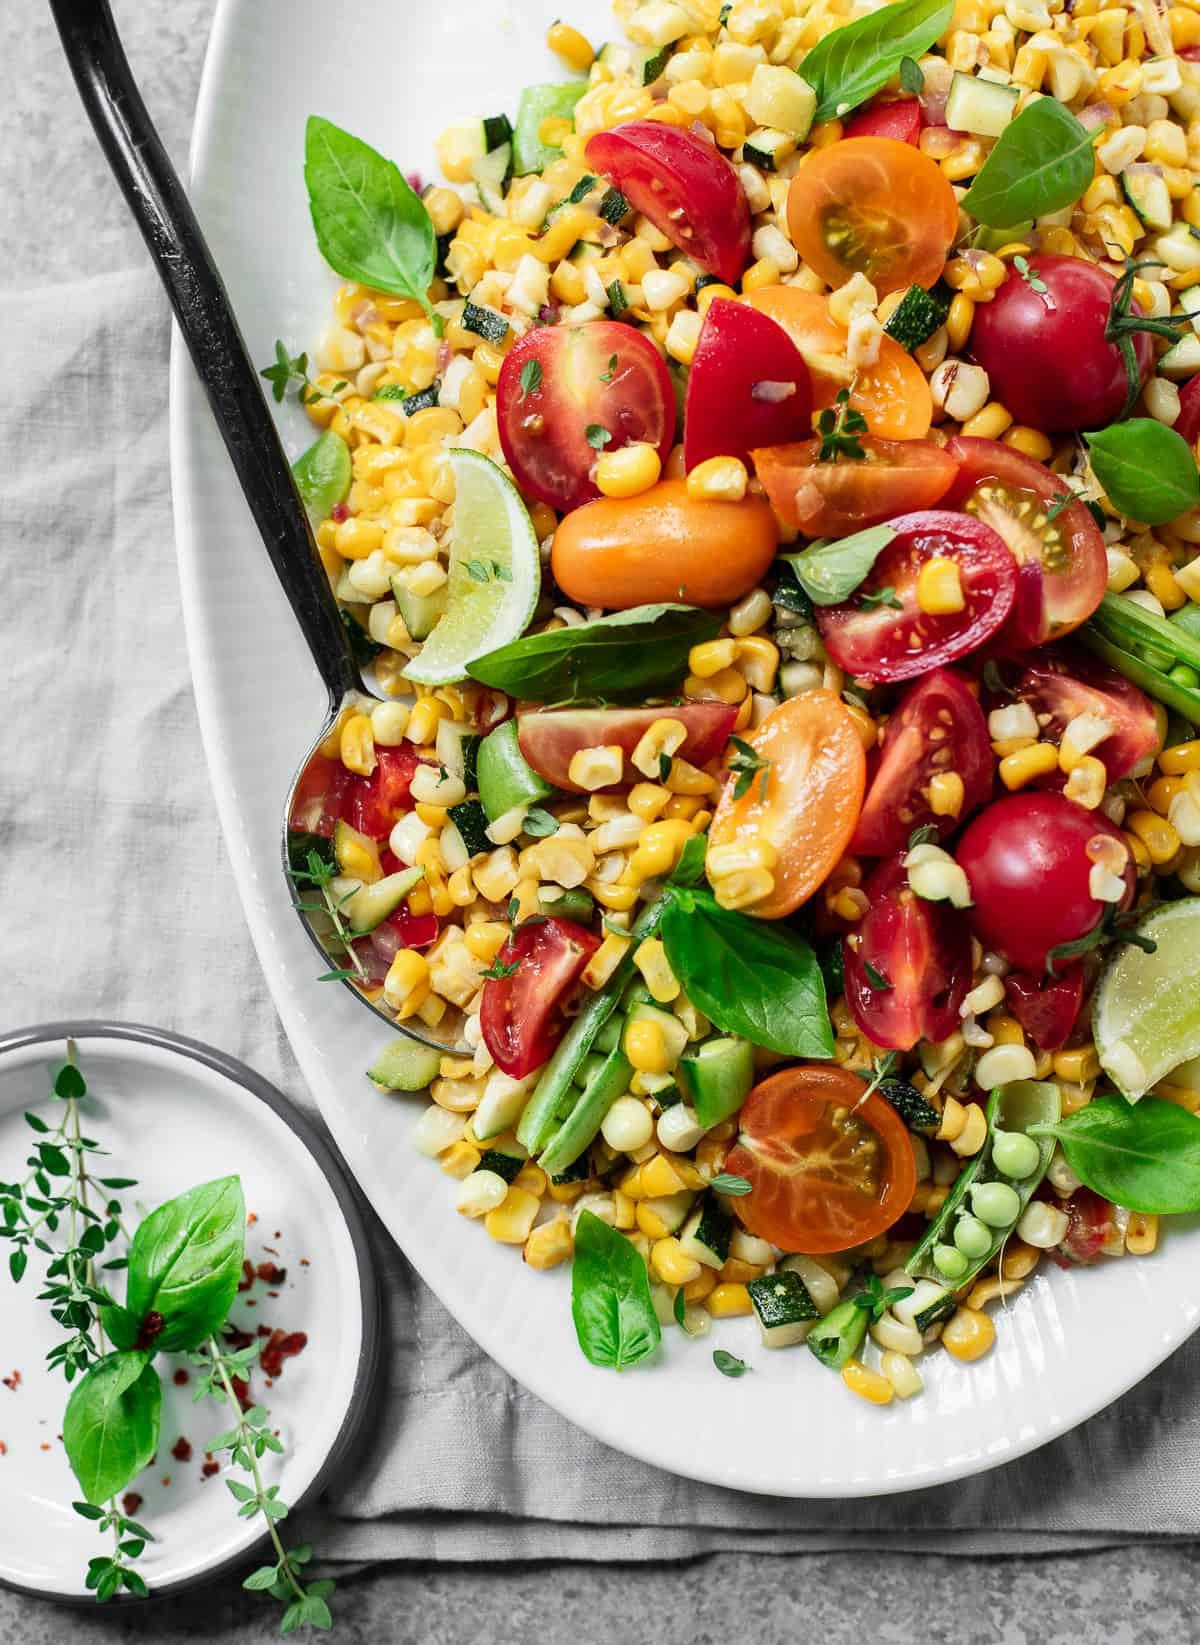 Summer Corn Succotash Salad with Tomatoes and Basil